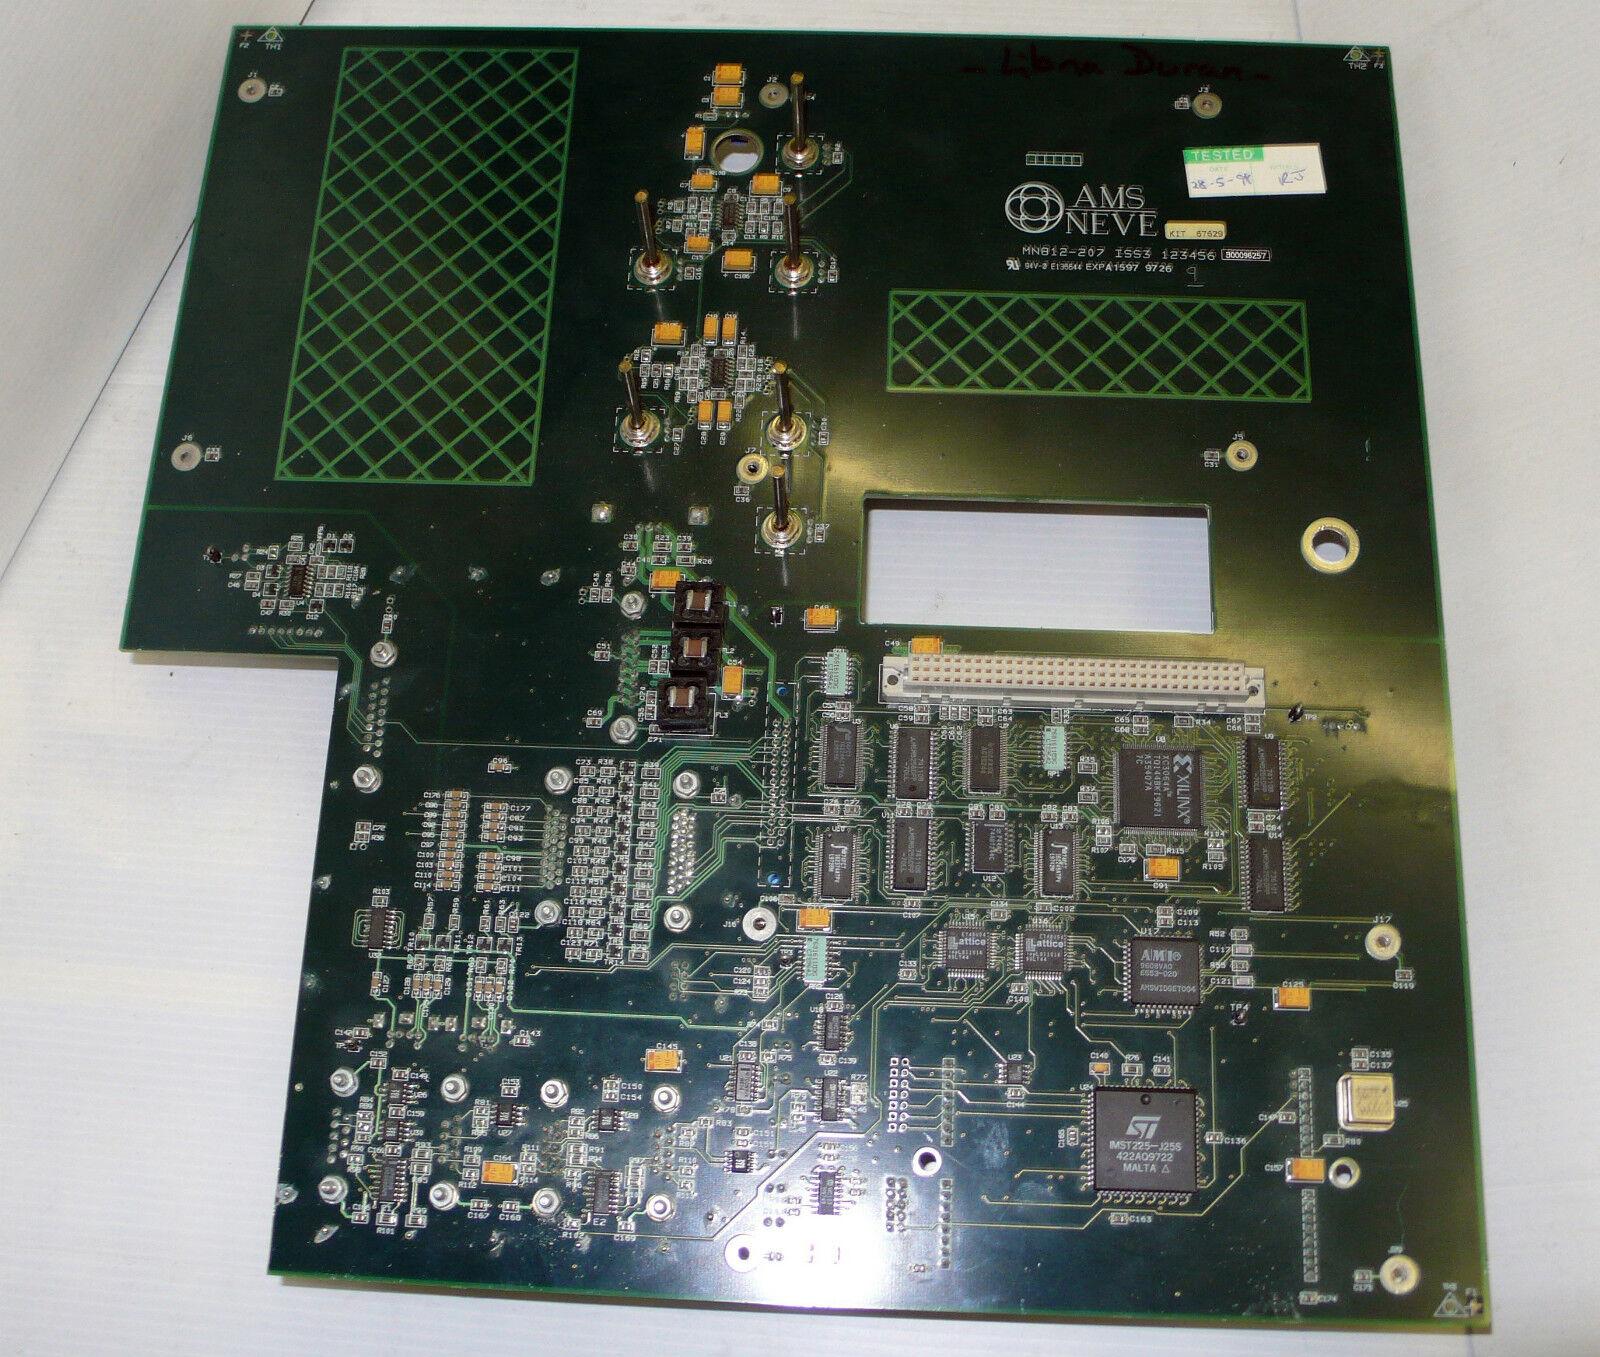 Card Ams Neve For Mixer Studio Libra